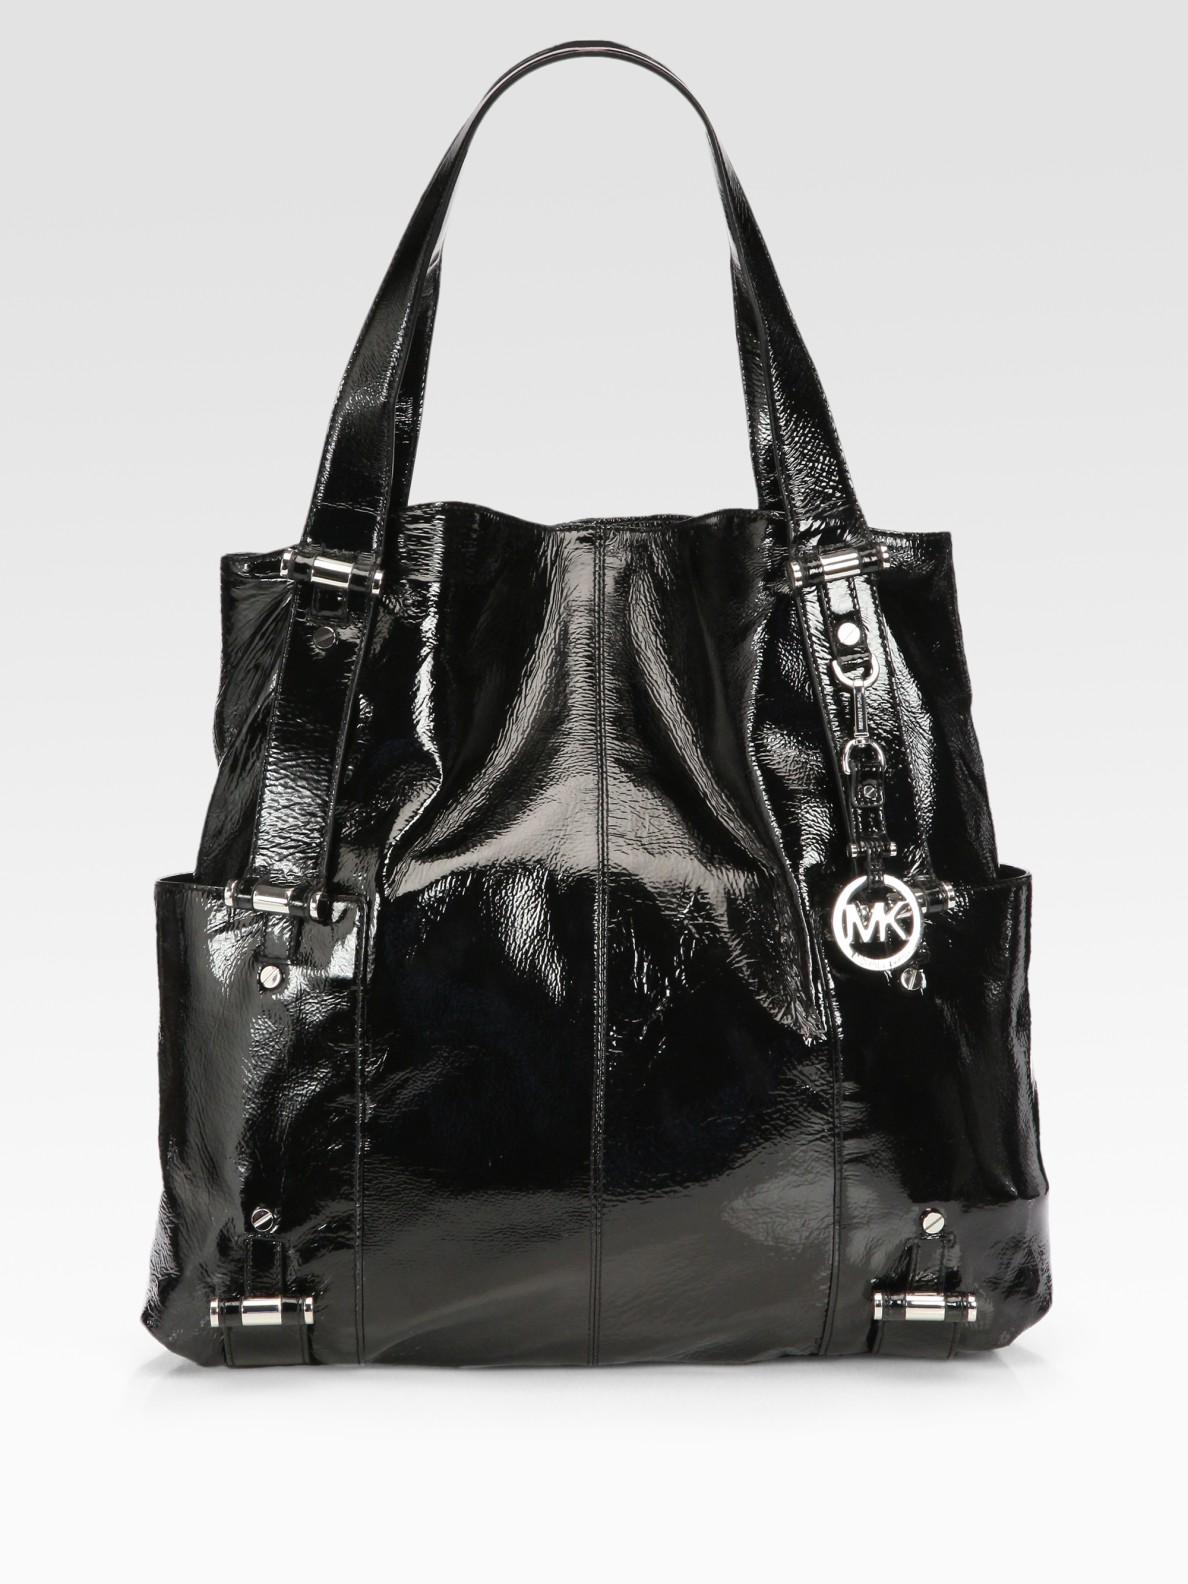 ffc47c0efdd2 Large Black Patent Leather Tote Bag | Stanford Center for ...